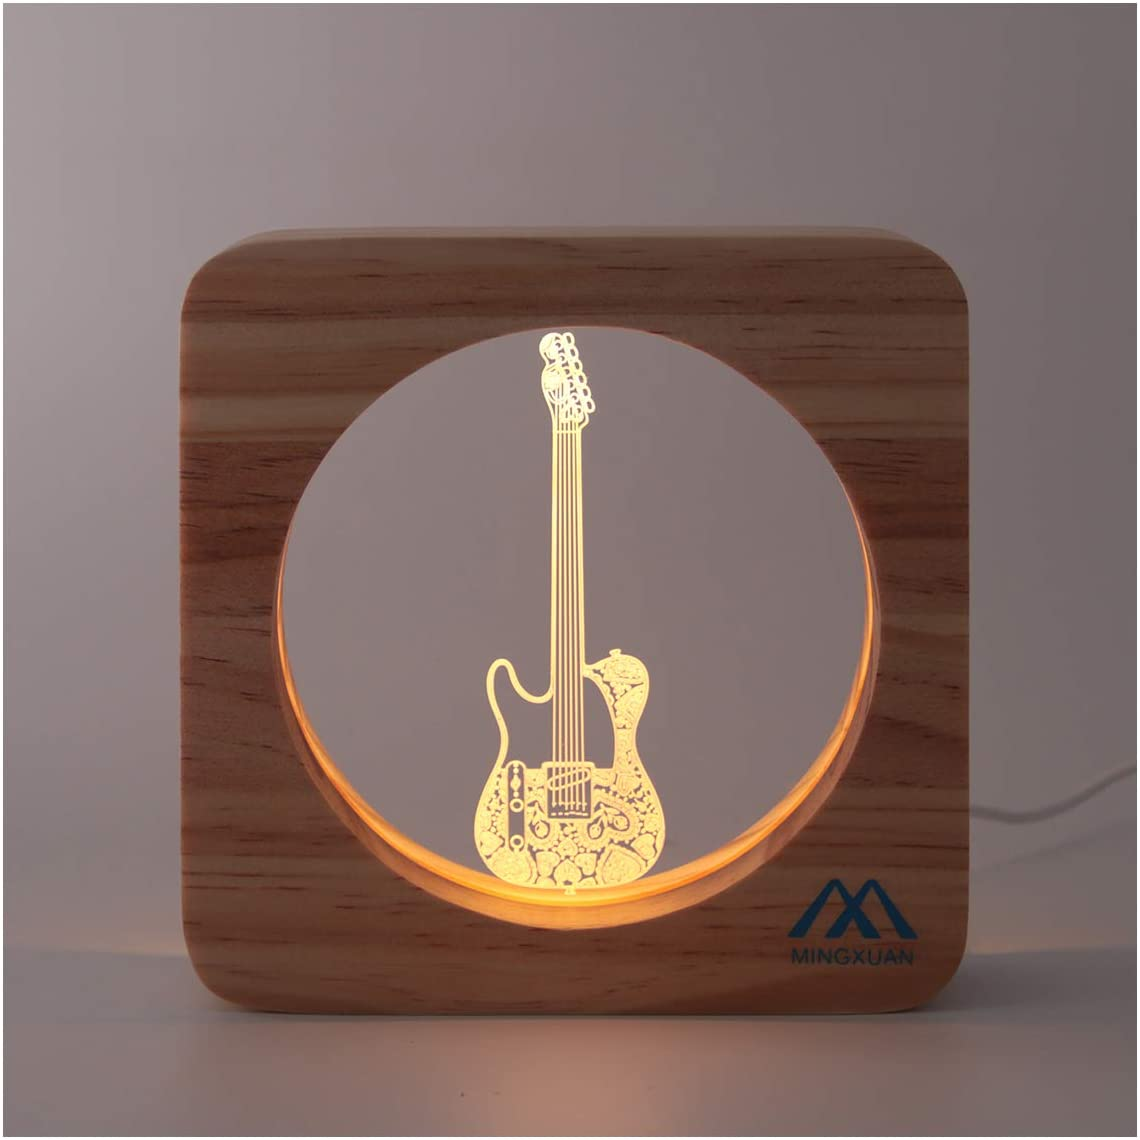 Creative Cute 3D Night Light Electric Guitar Wooded Frame USB Power Warm White Light Baby Room Bed Lights Kids Room Nursery Decorative Night Lamp Kids Girls Boy Adult Gift